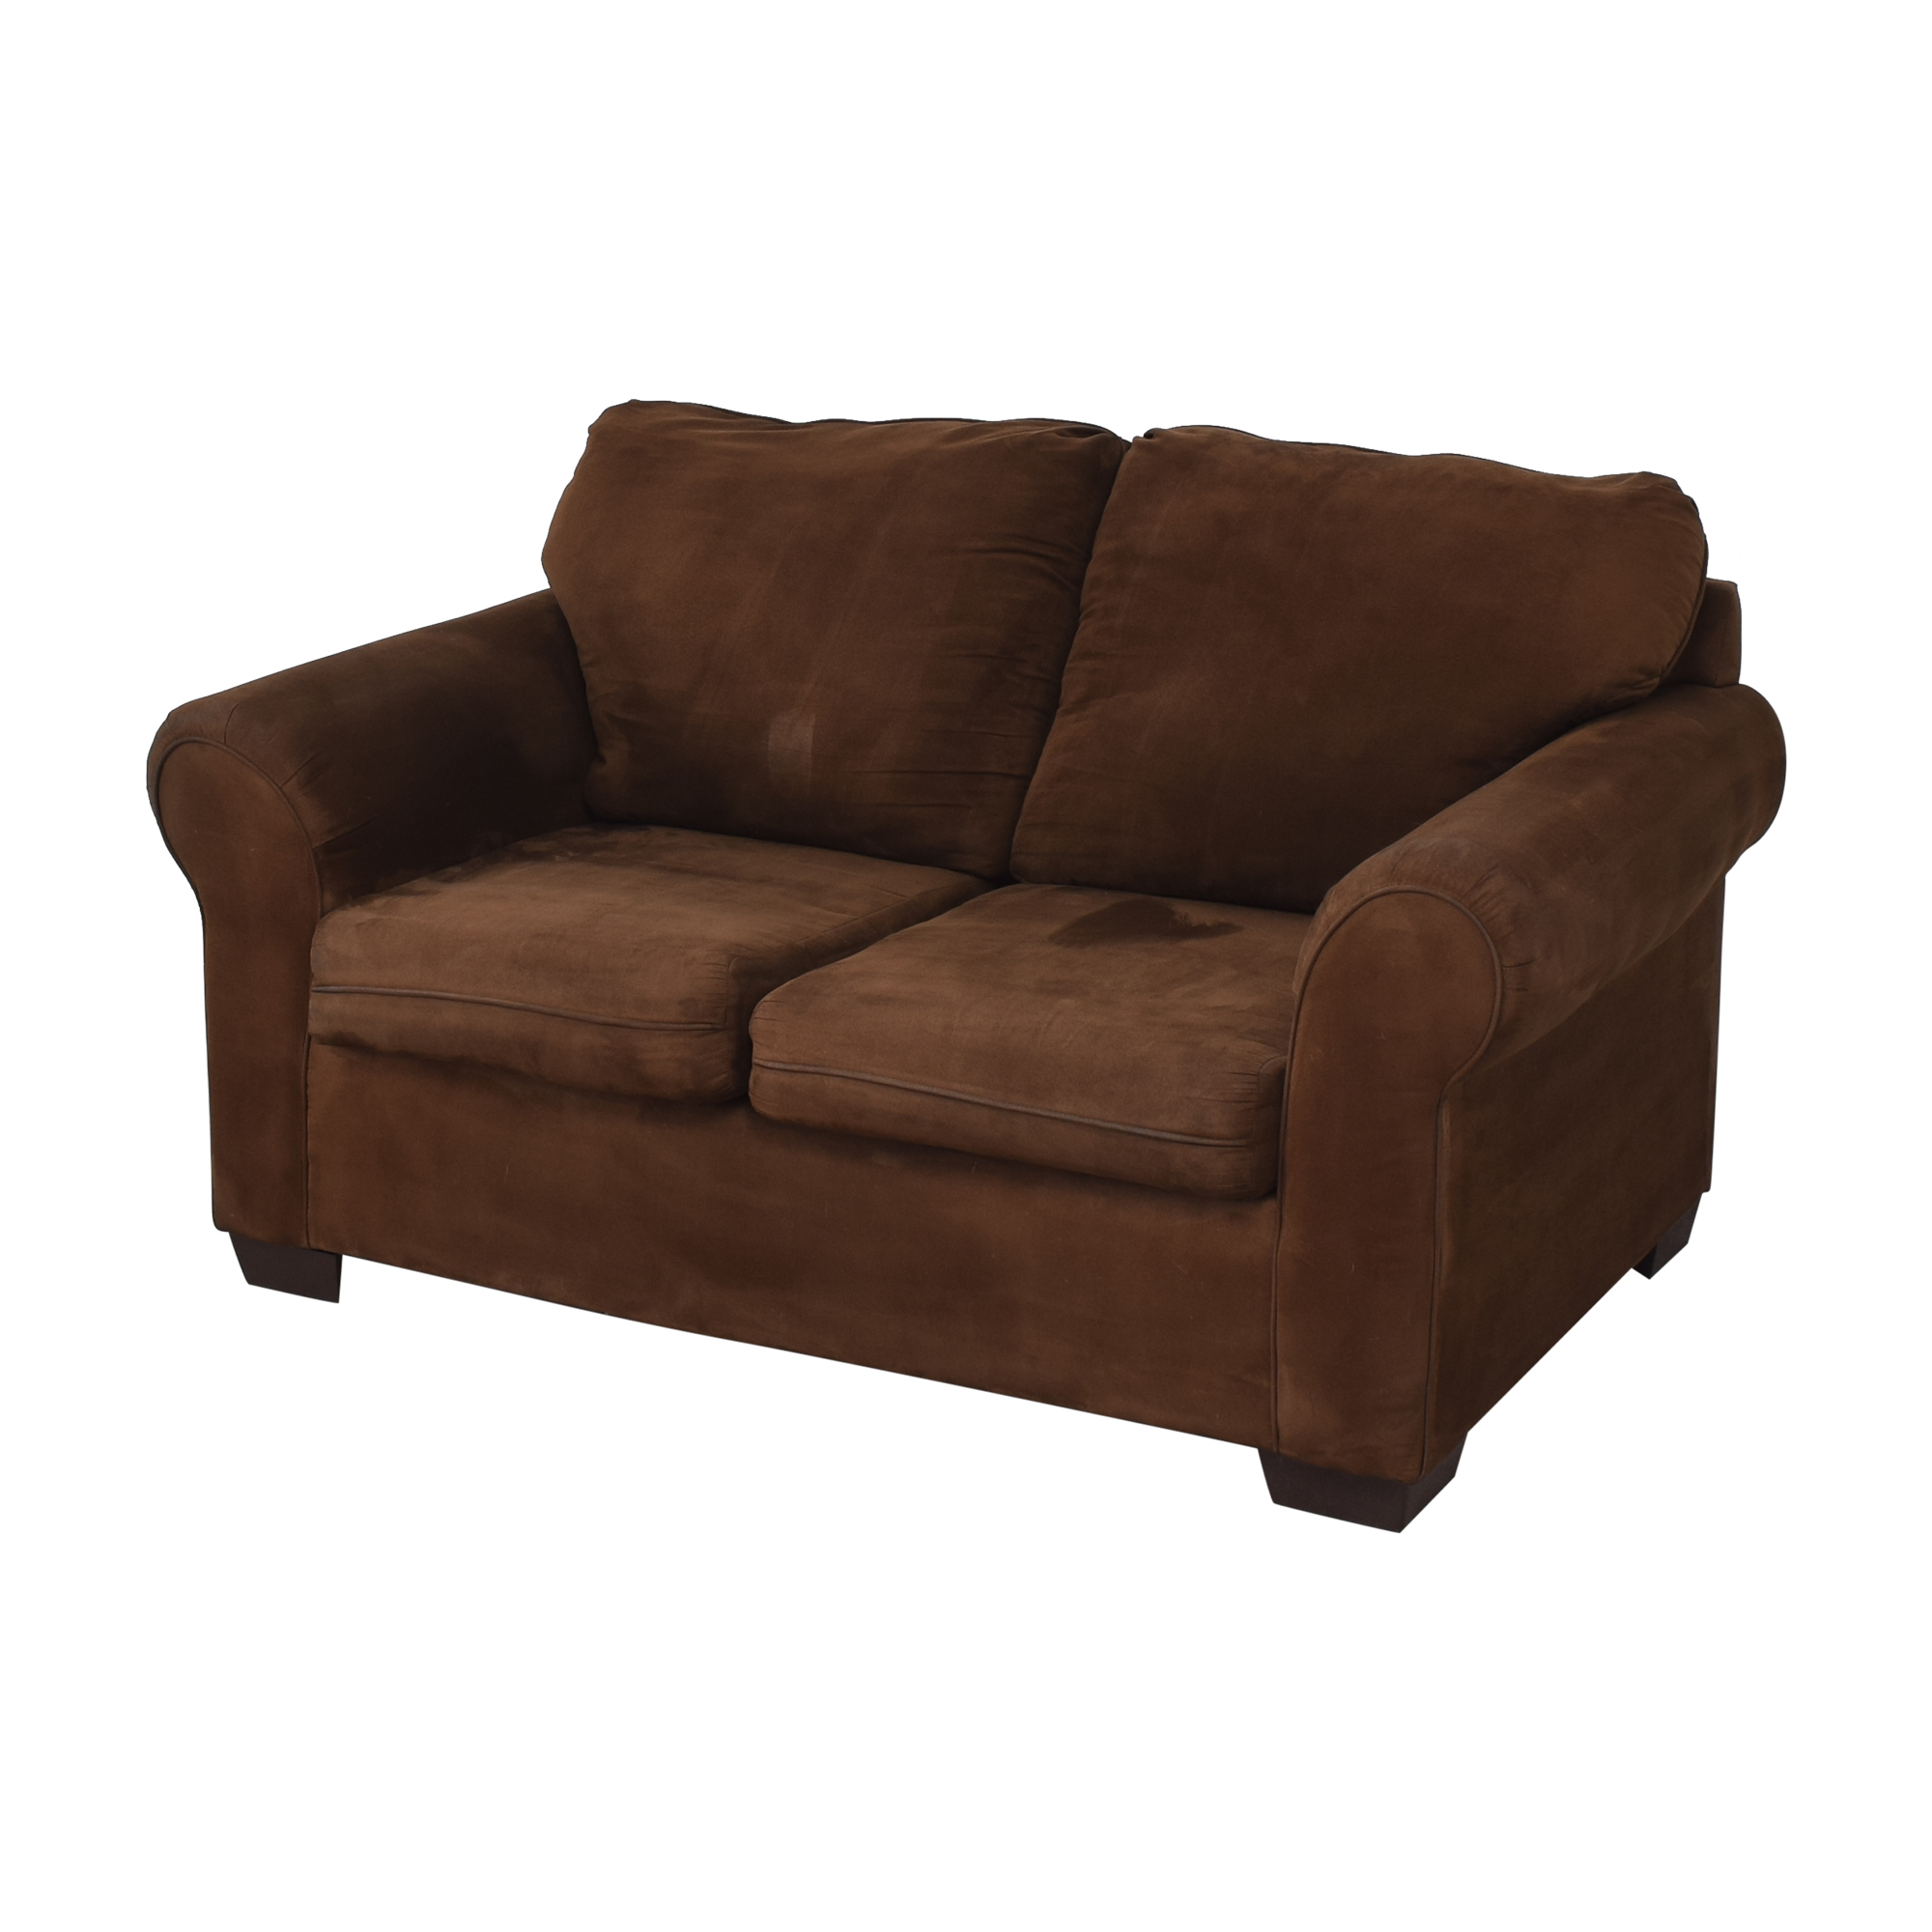 buy United Furniture United Furniture Roll Arm Loveseat online